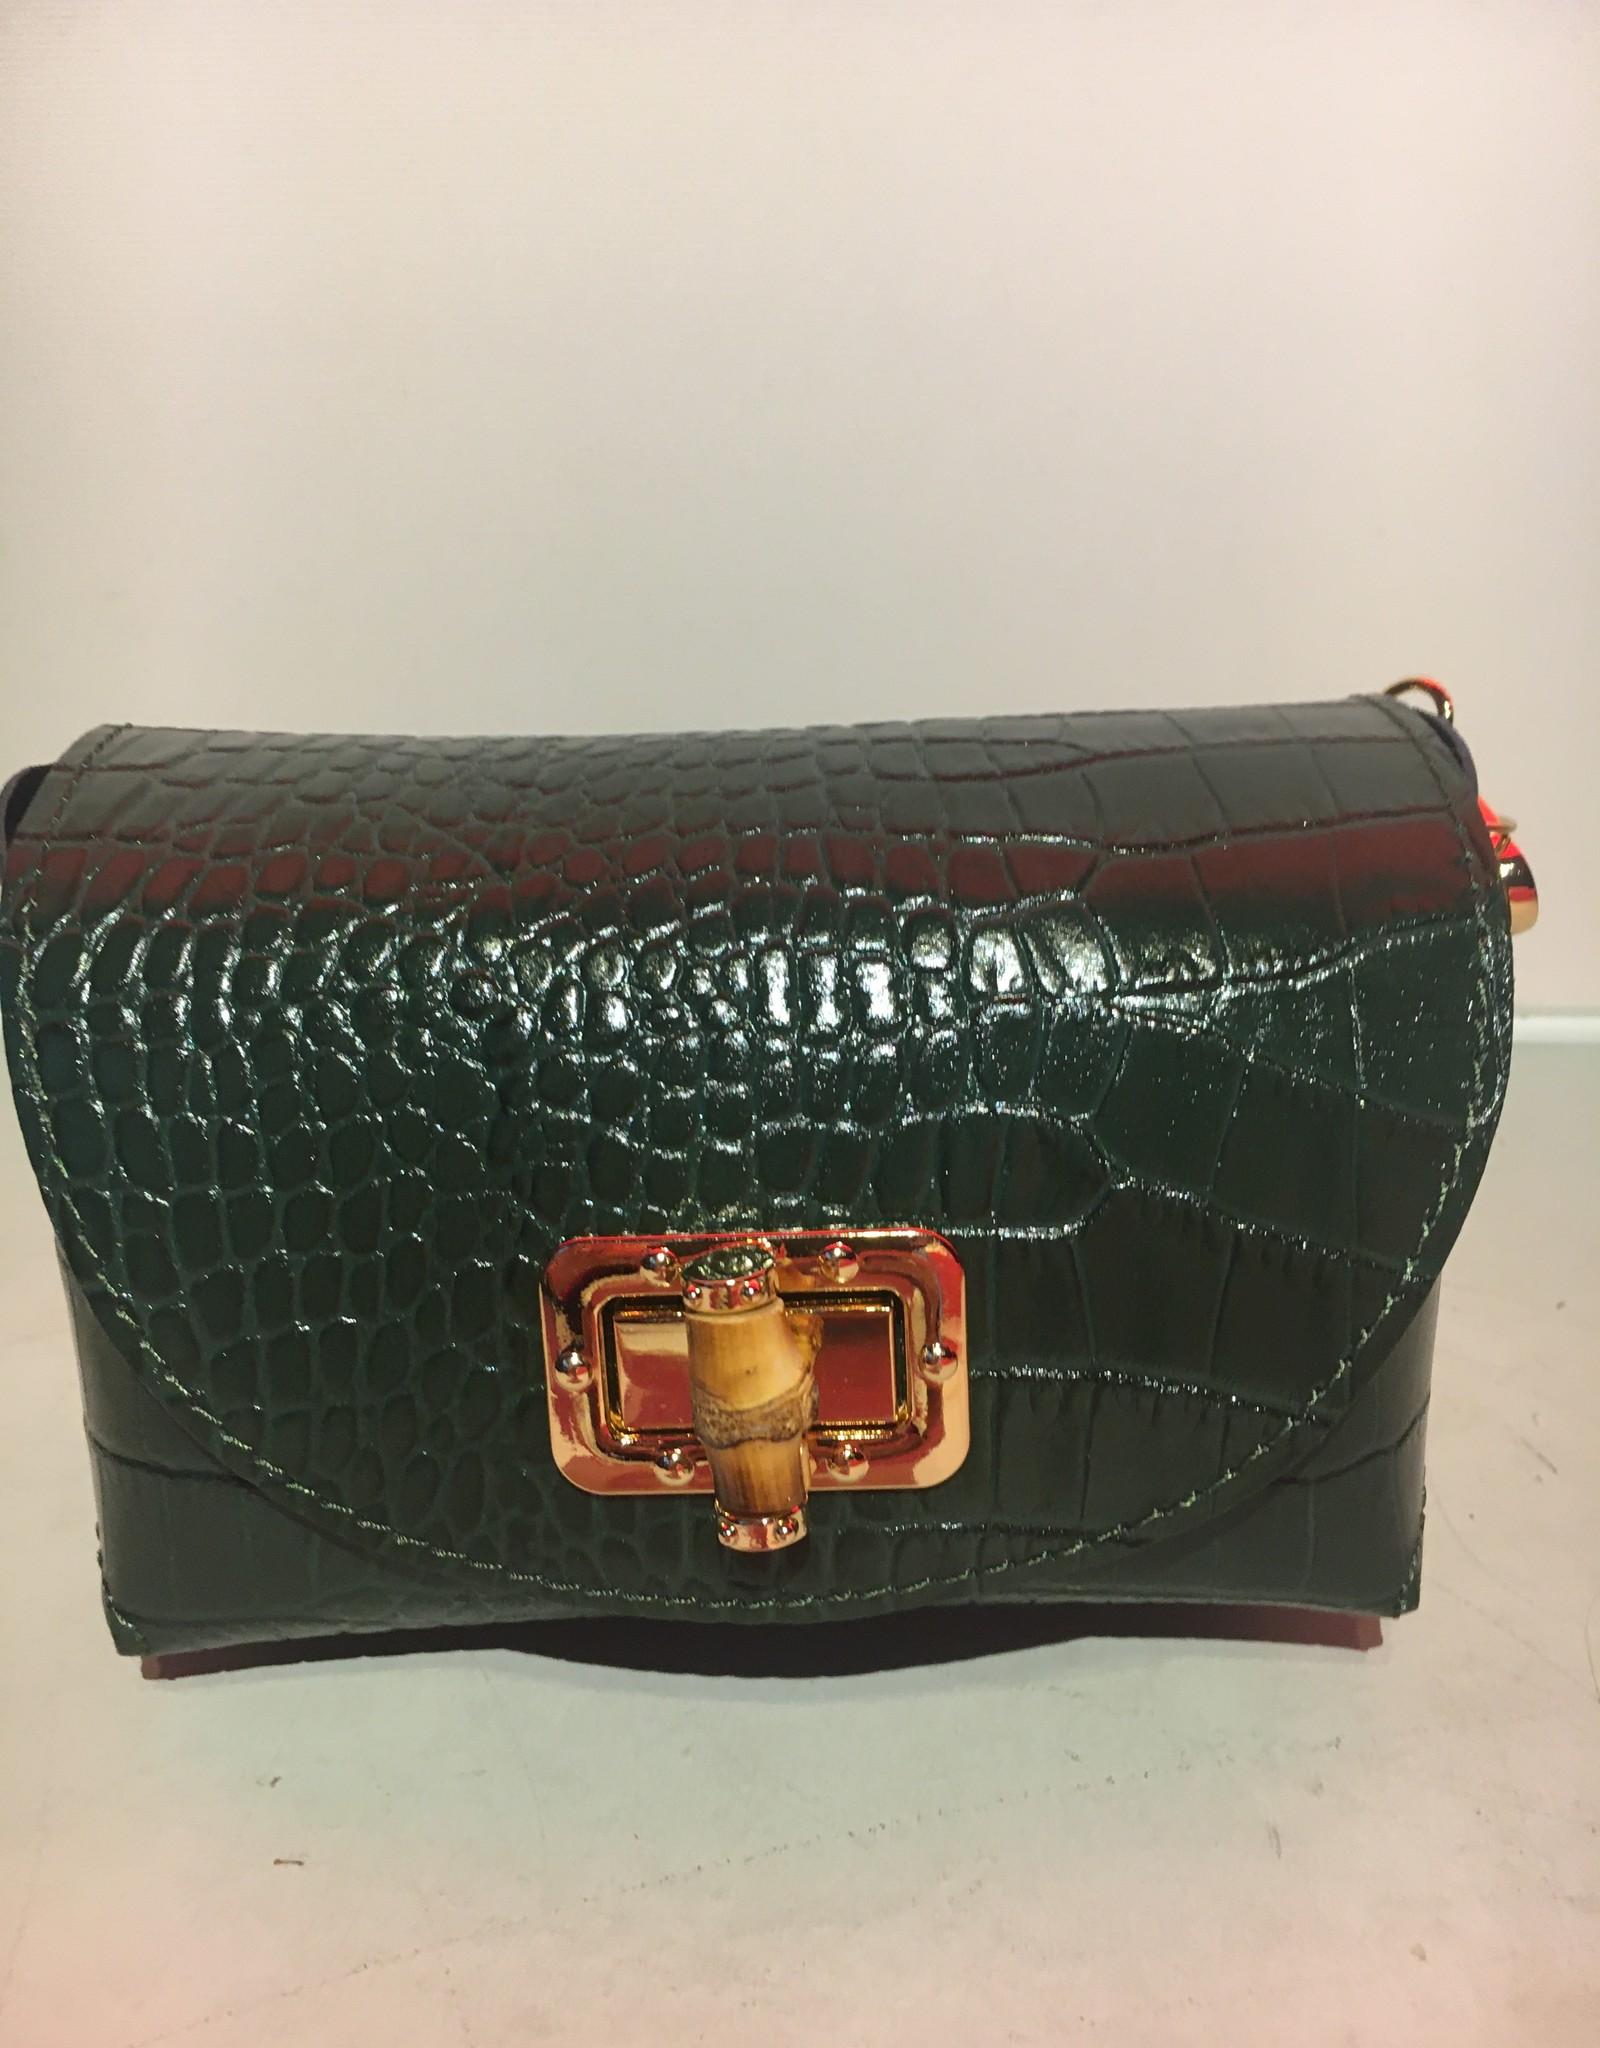 Mondieux Madame Little shoulder bag, crocodile leather